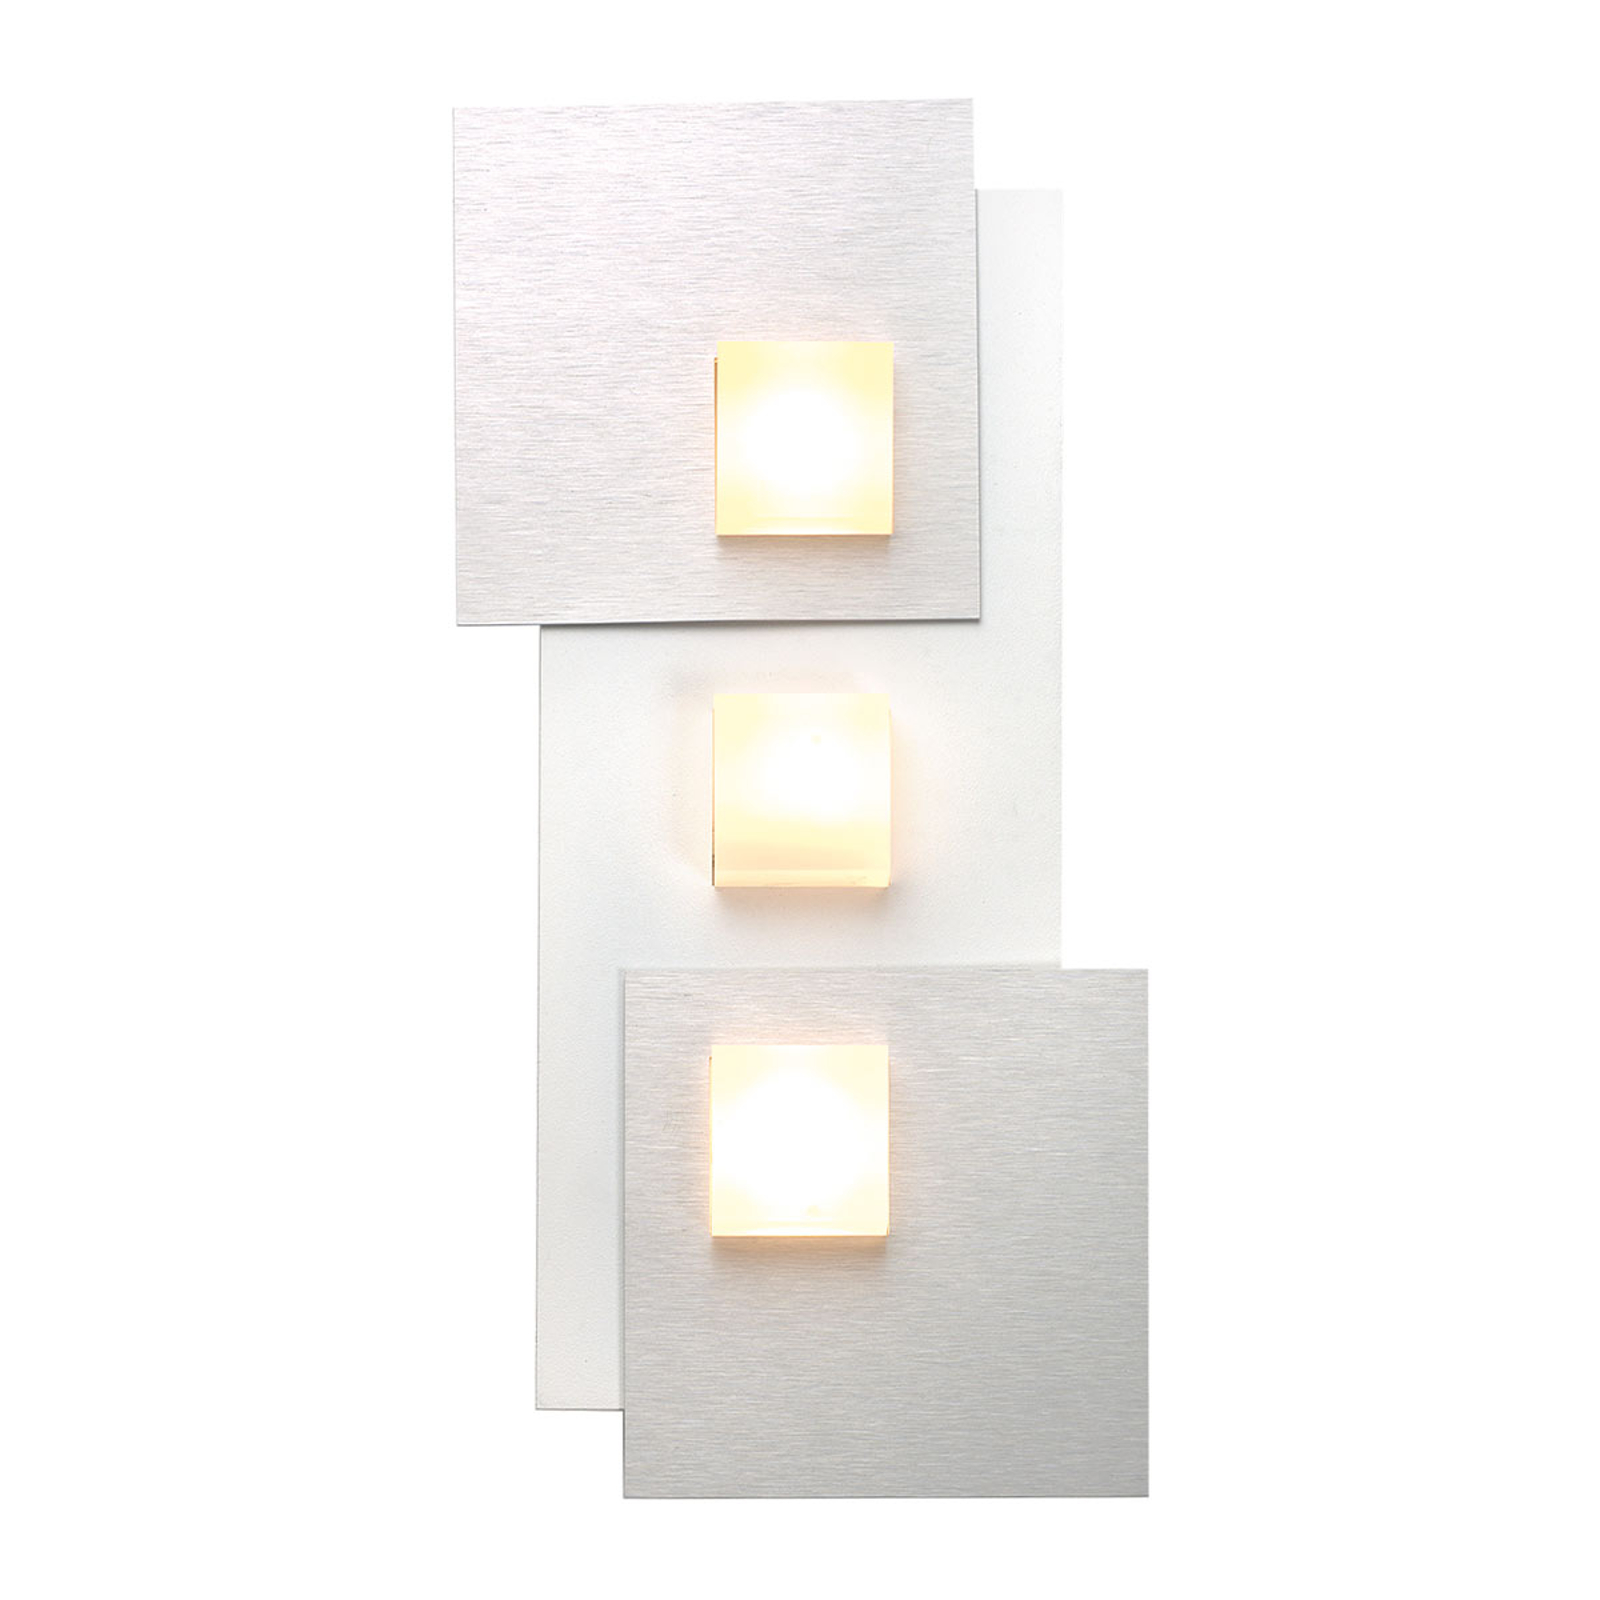 Bopp Pixel 2.0 lampa sufitowa LED 3-punktowa alu